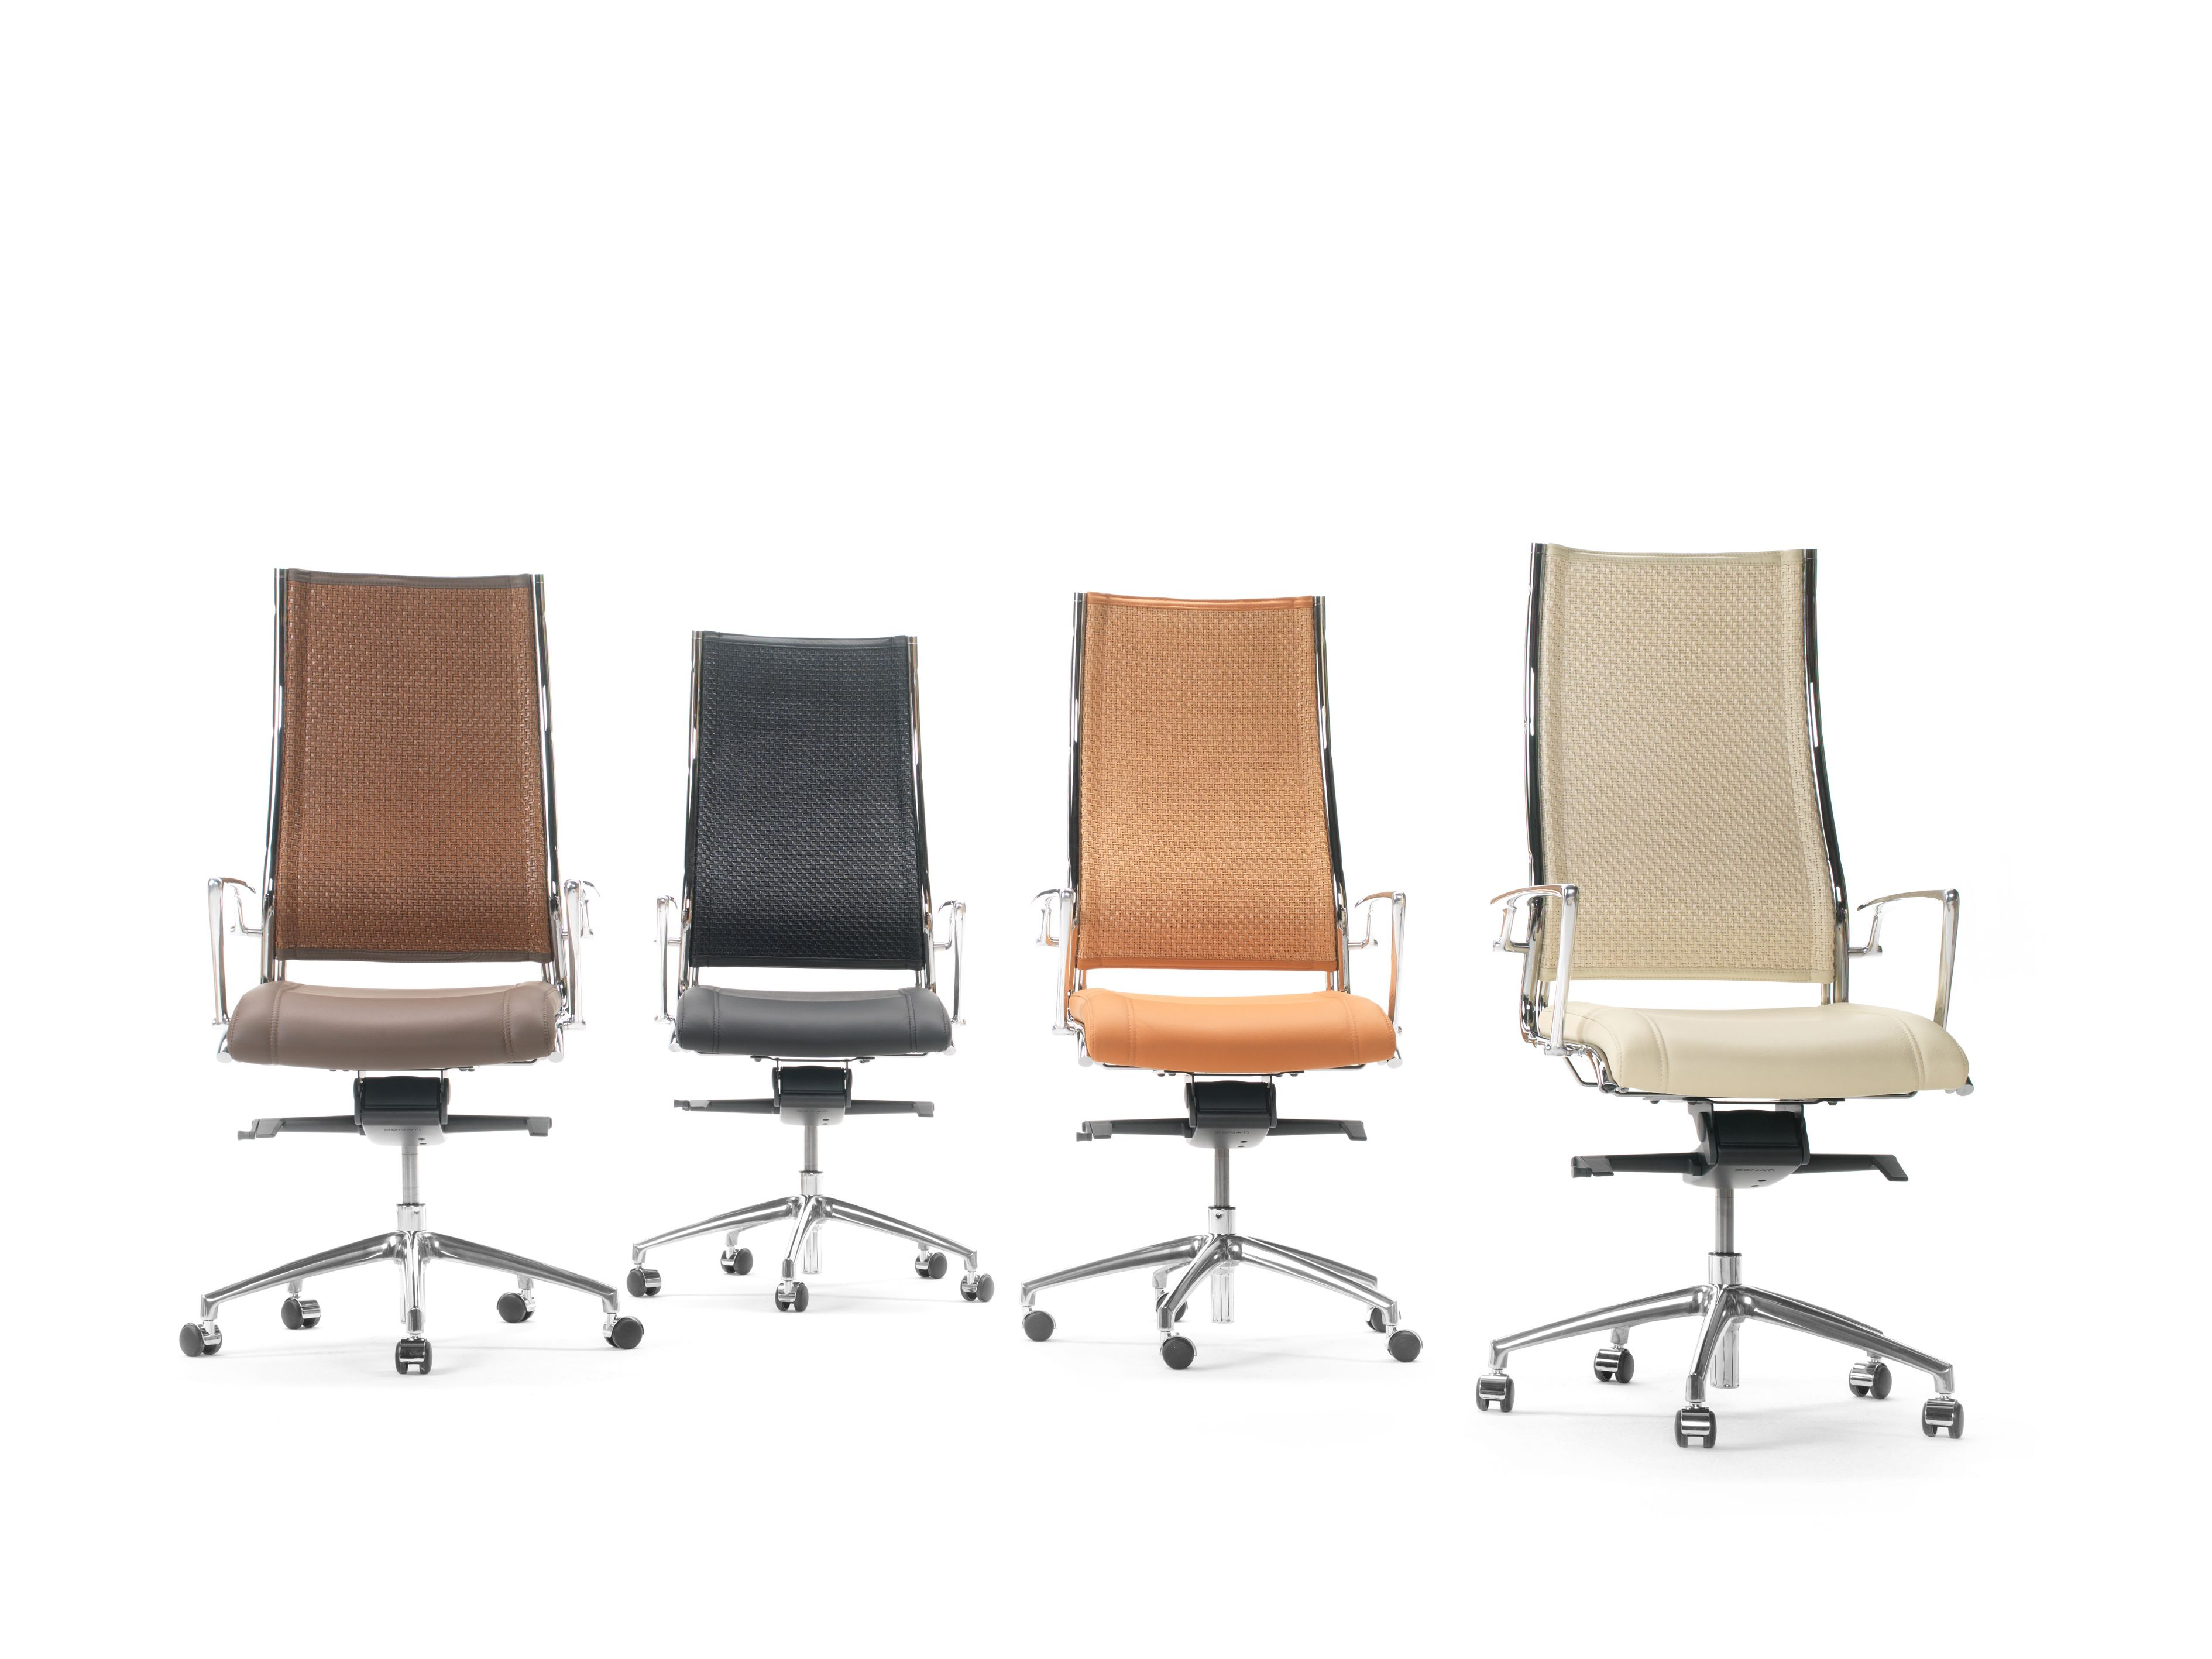 Havana high back executive mesh or rattan back chairs in a